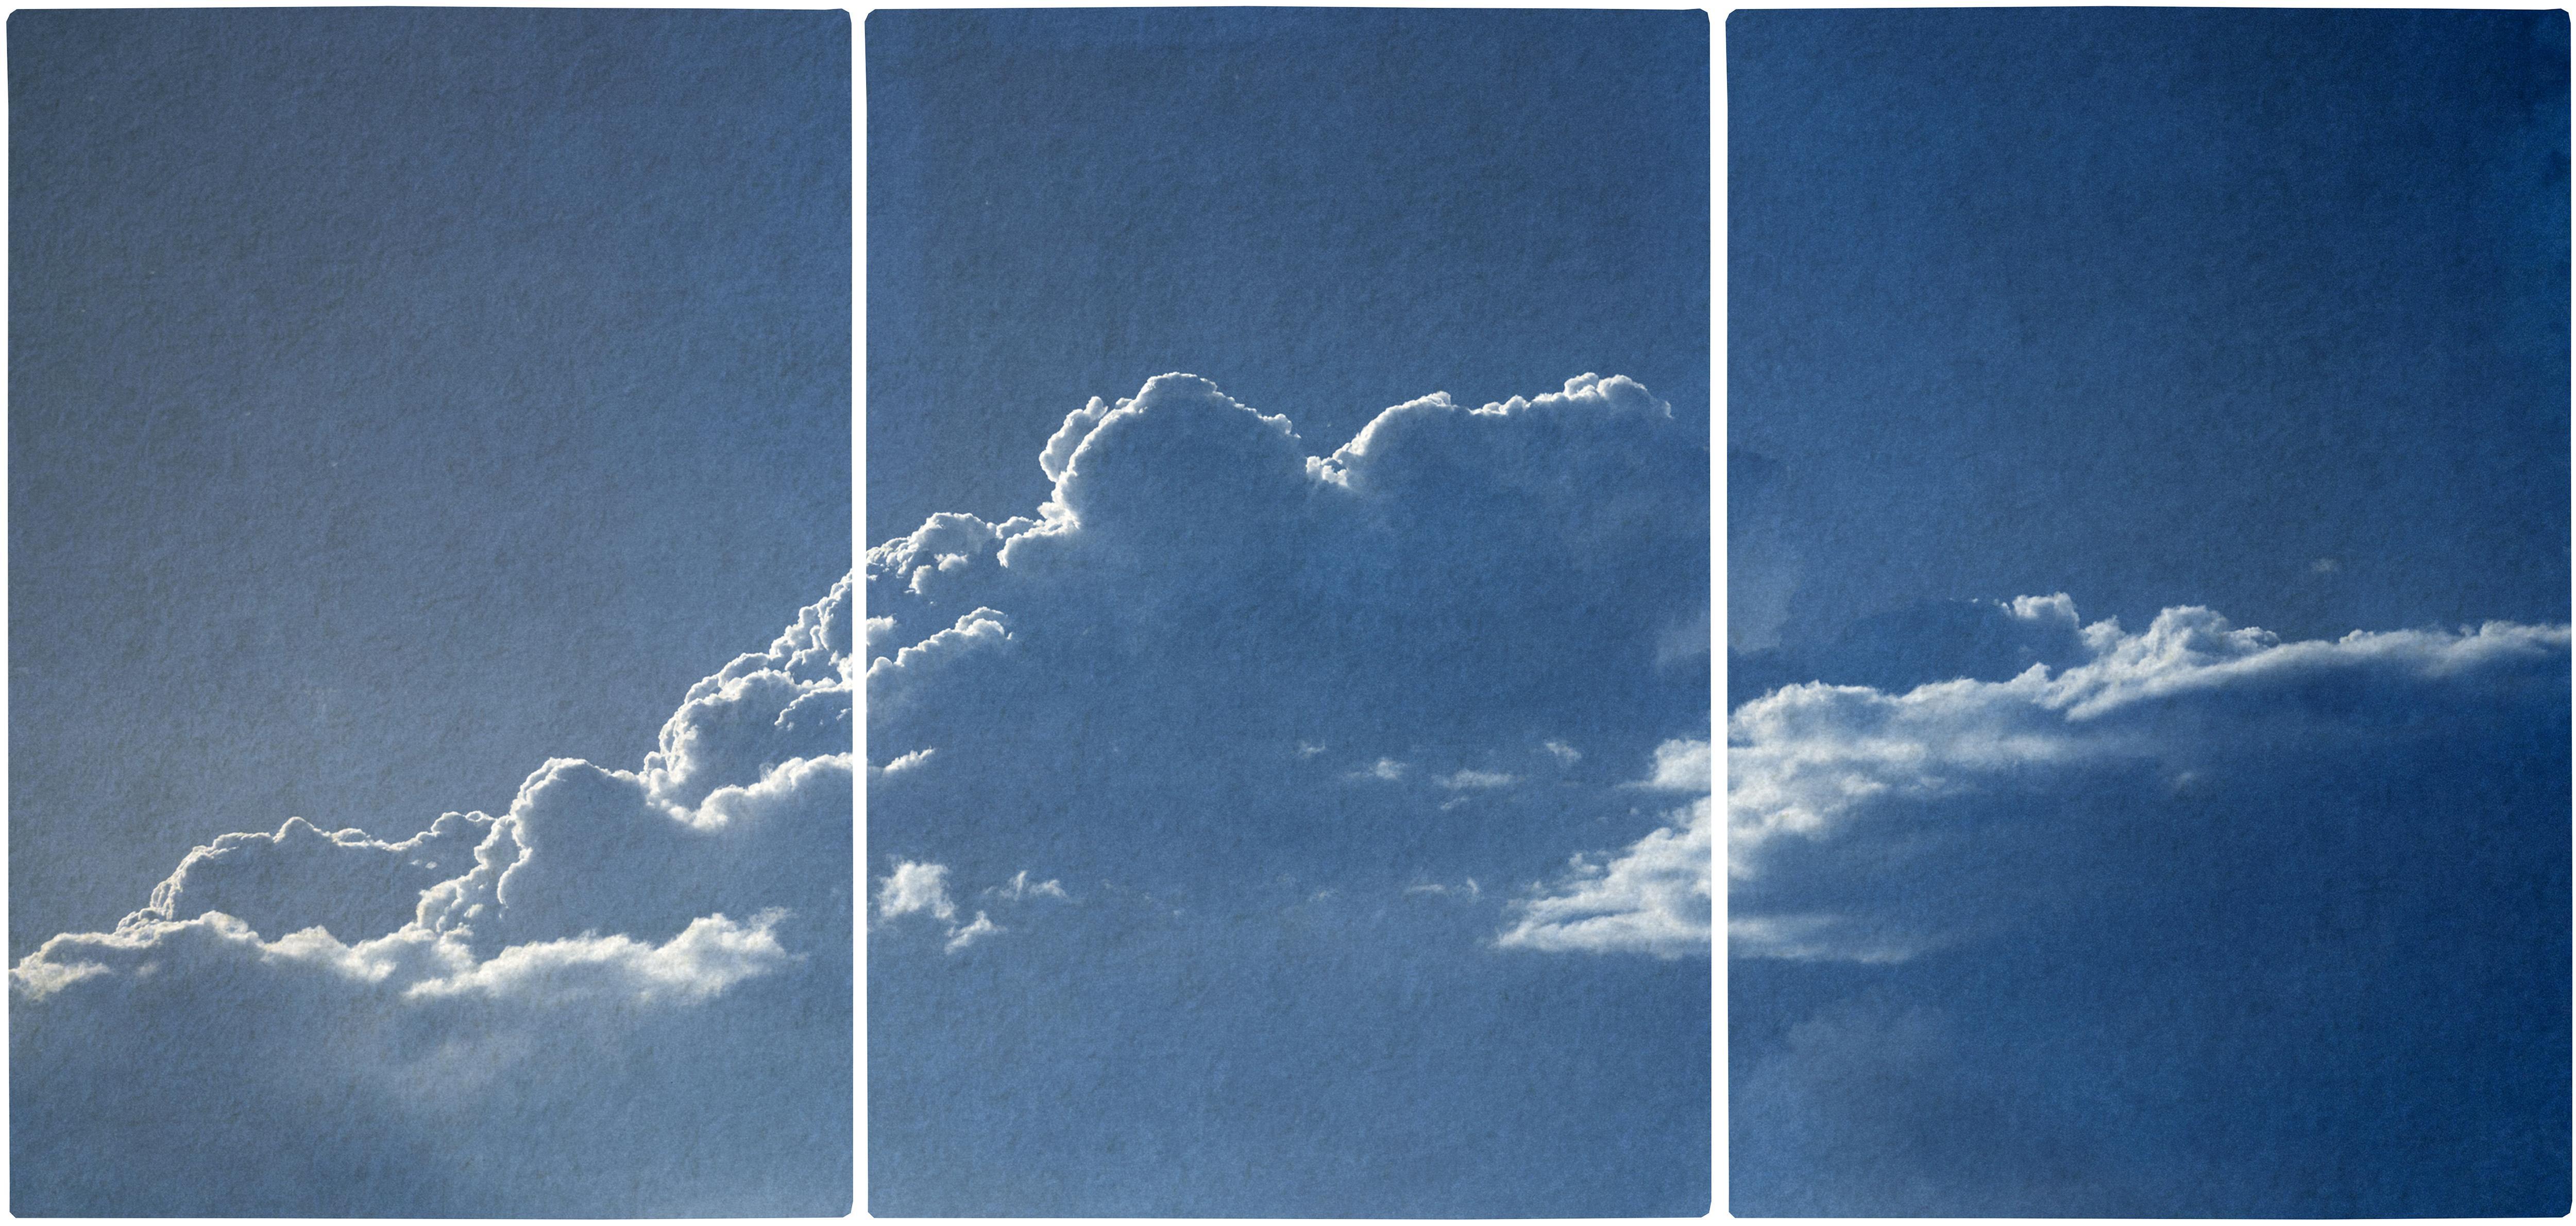 Blue Tones Triptych of Serene Cloudy Sky, Handmade Cyanotype Print on Paper 2021